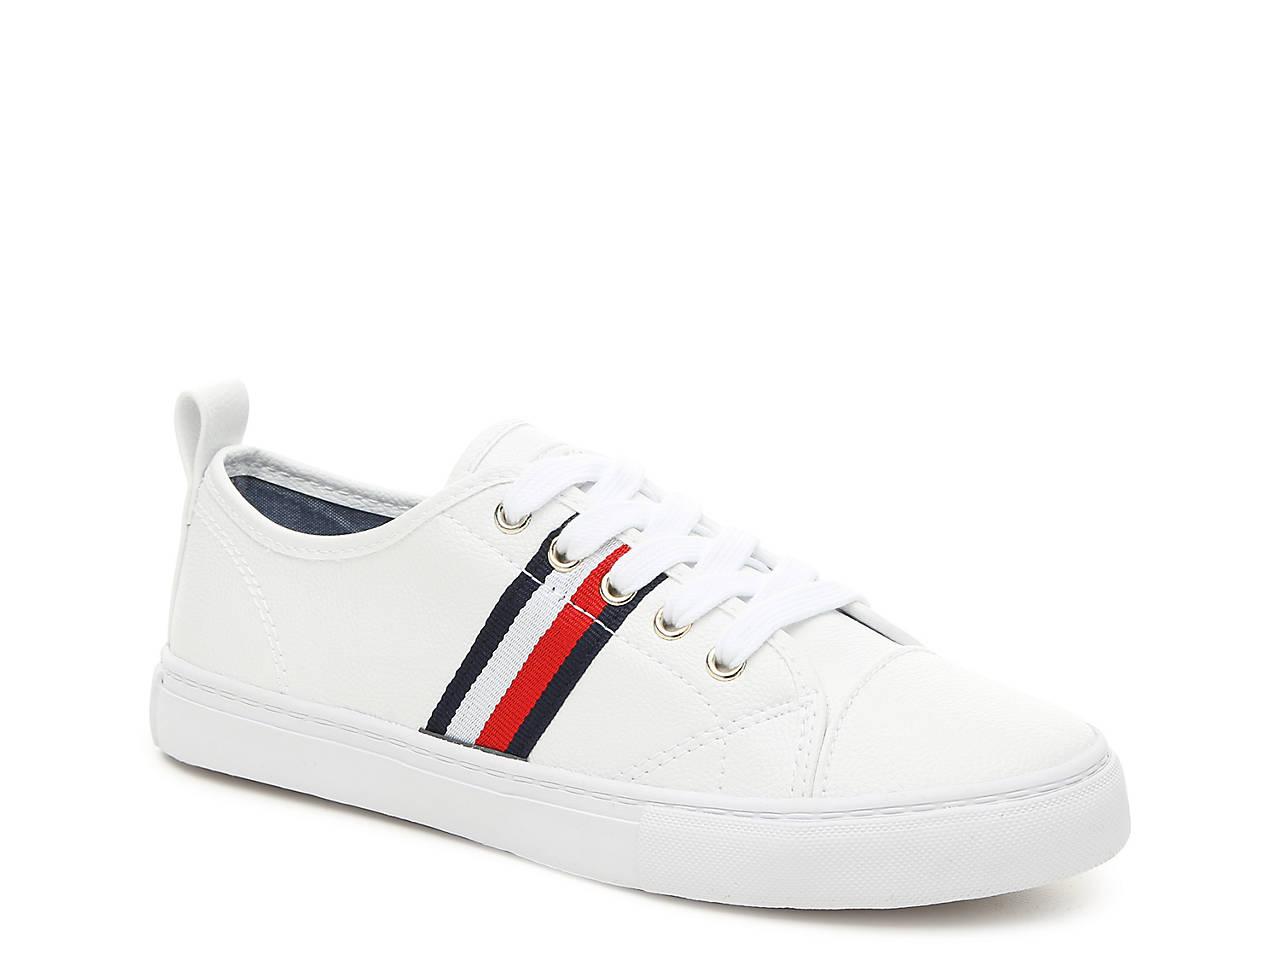 Tommy Hilfiger Sneakers White recommander Sast Prix Pas Cher Jeu Ebay CQkbRT6x